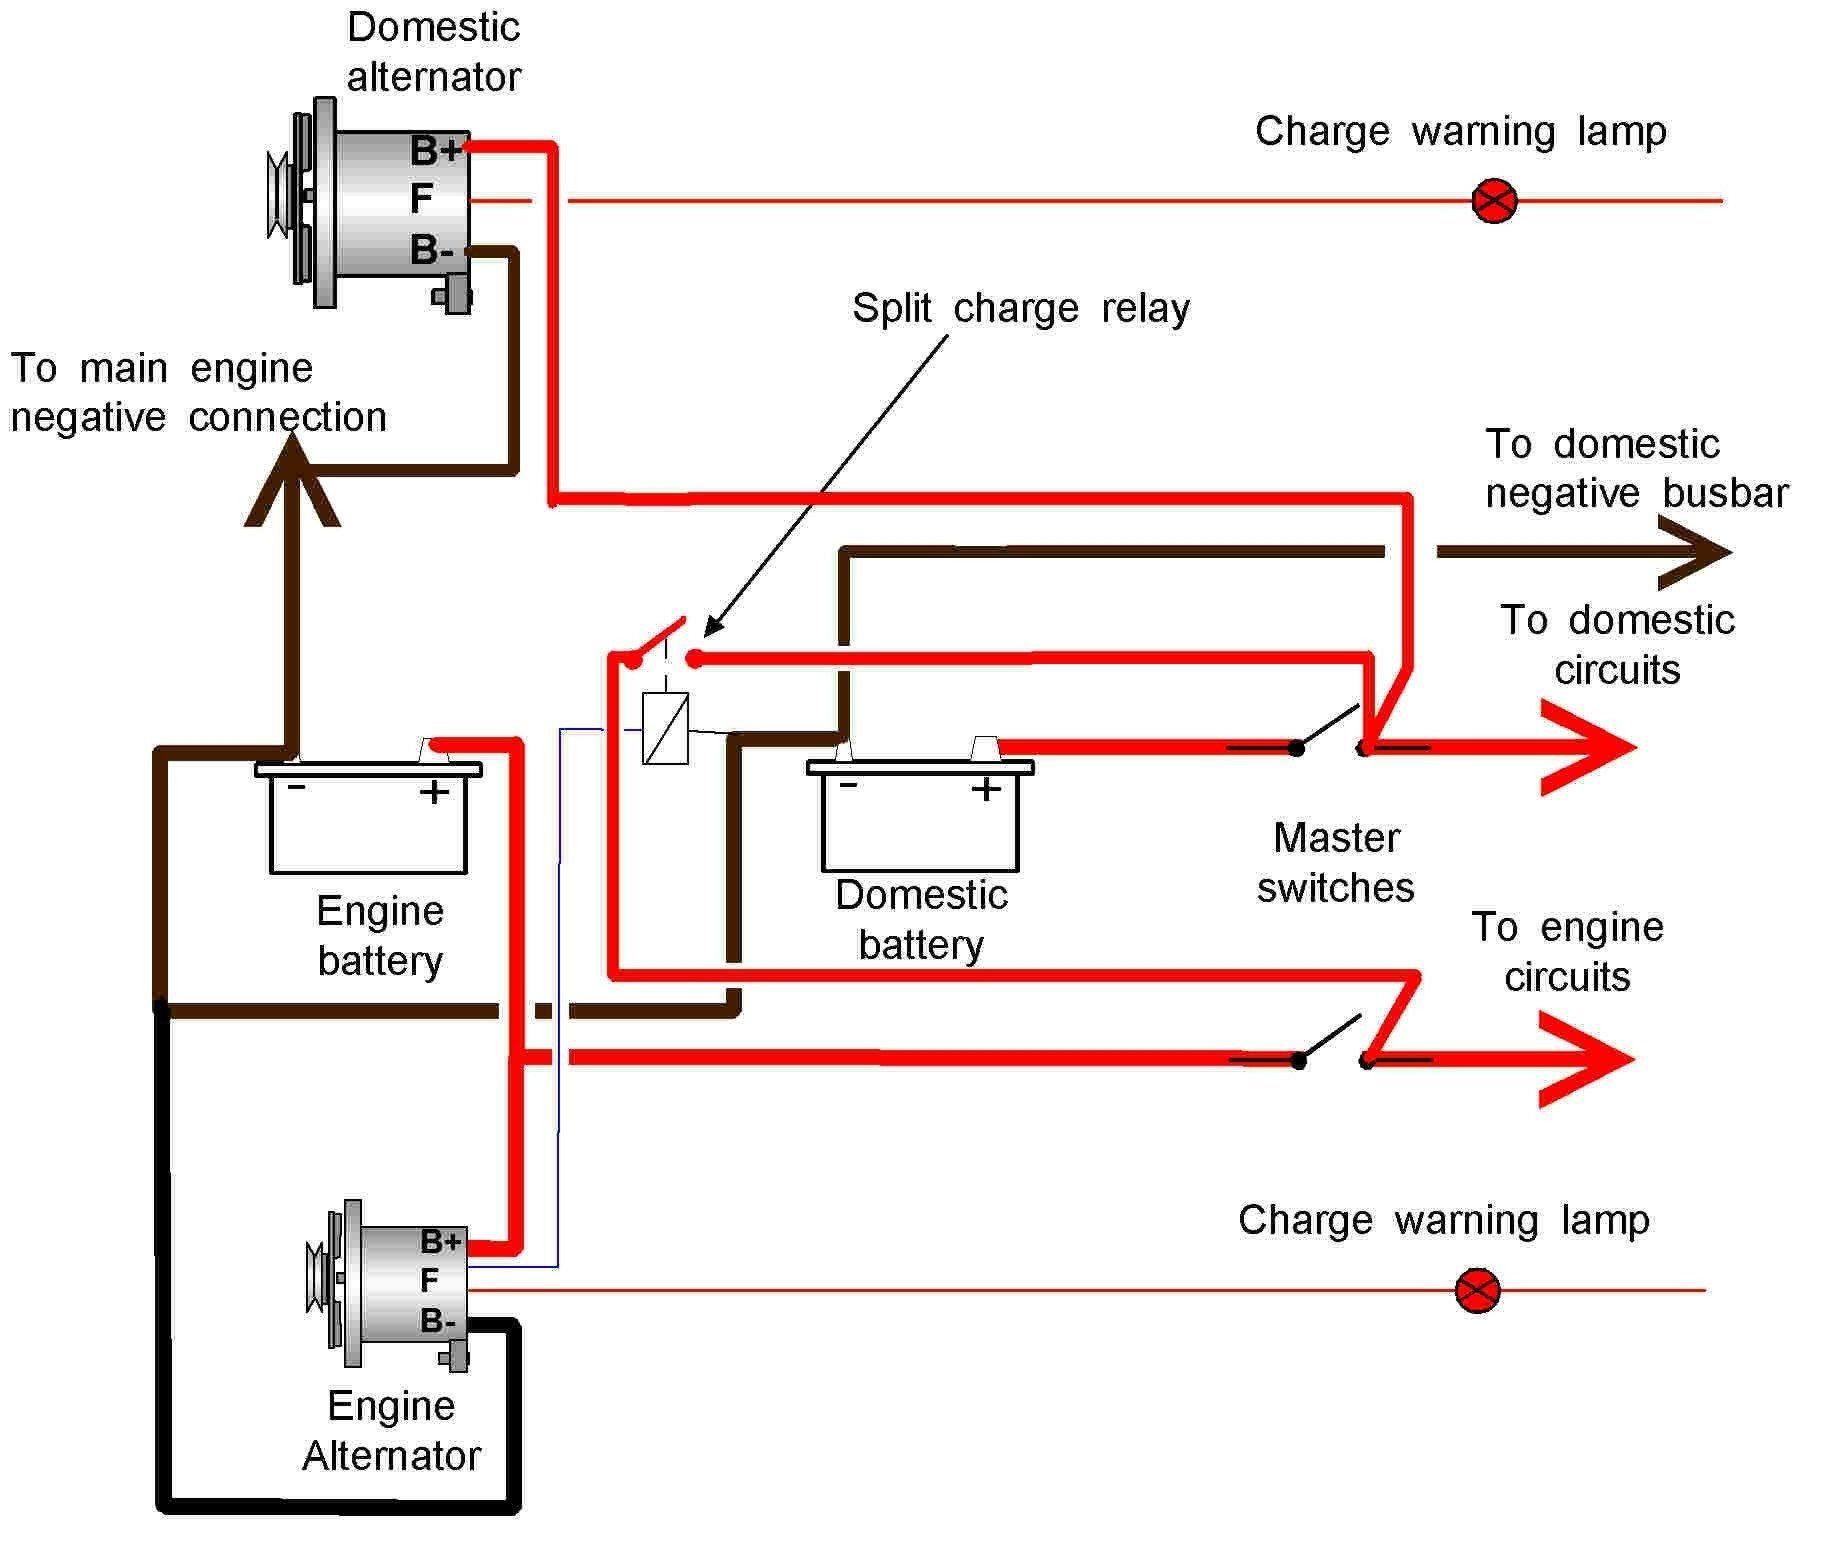 medium resolution of marine alternator wiring diagram wiring diagram load motorola marine alternator wiring diagram marine alternator wiring diagram